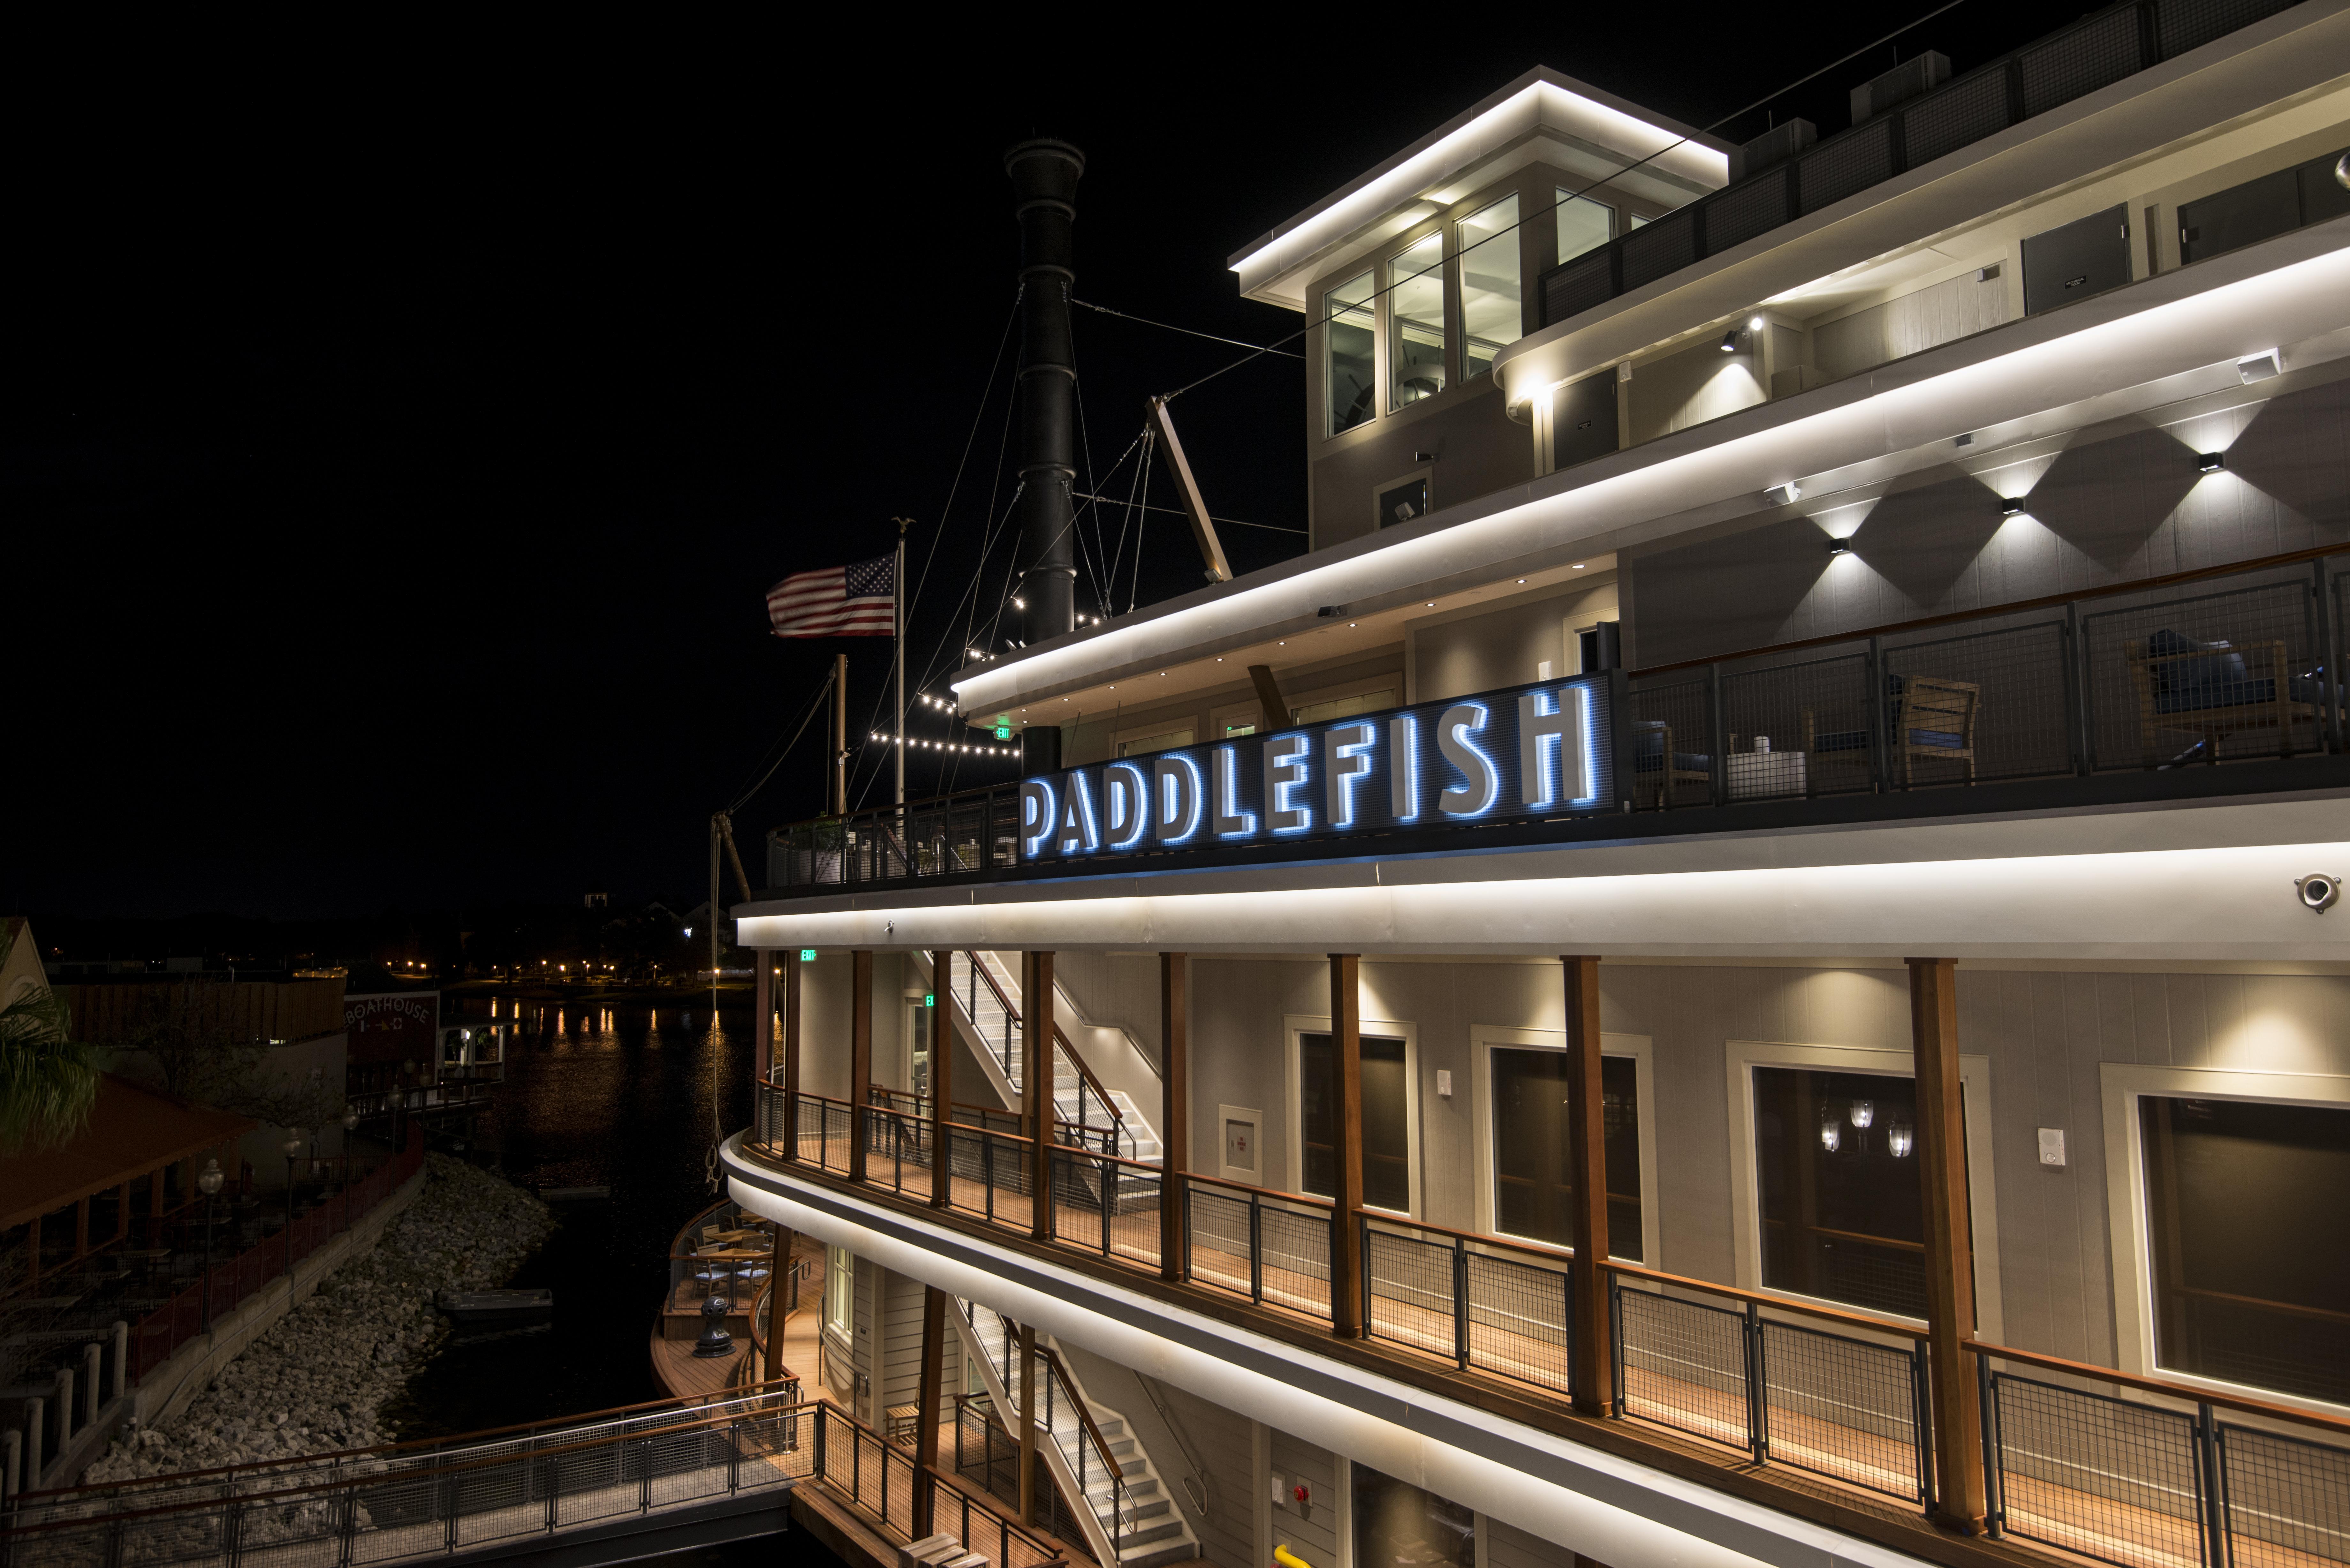 Paddlefish VIP Golden Ticket Giveaway